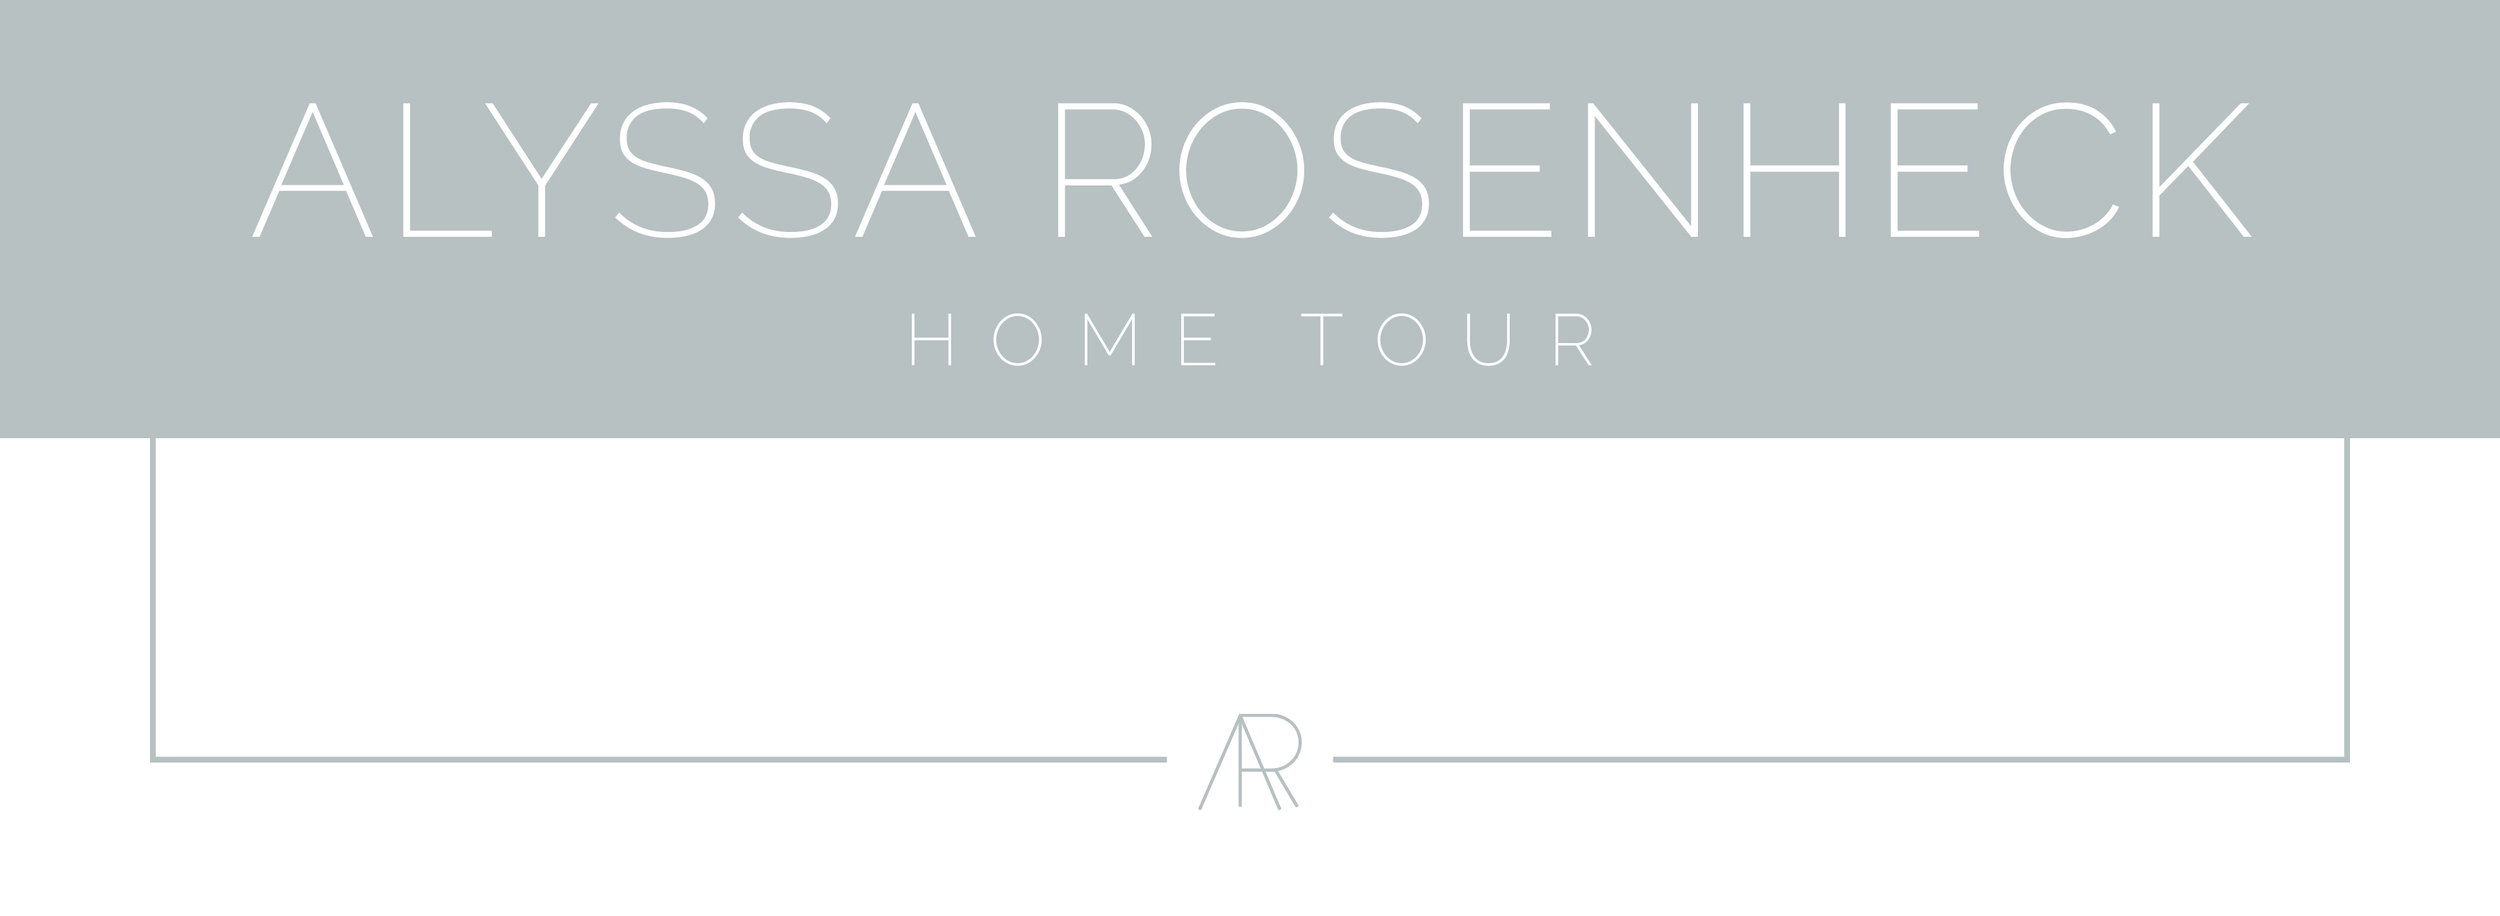 ©AlyssaRosenheck The New Southern feature in Elle Decor with Designer Katie Hackworth and Alyssa Rosenheck Seattle Washington